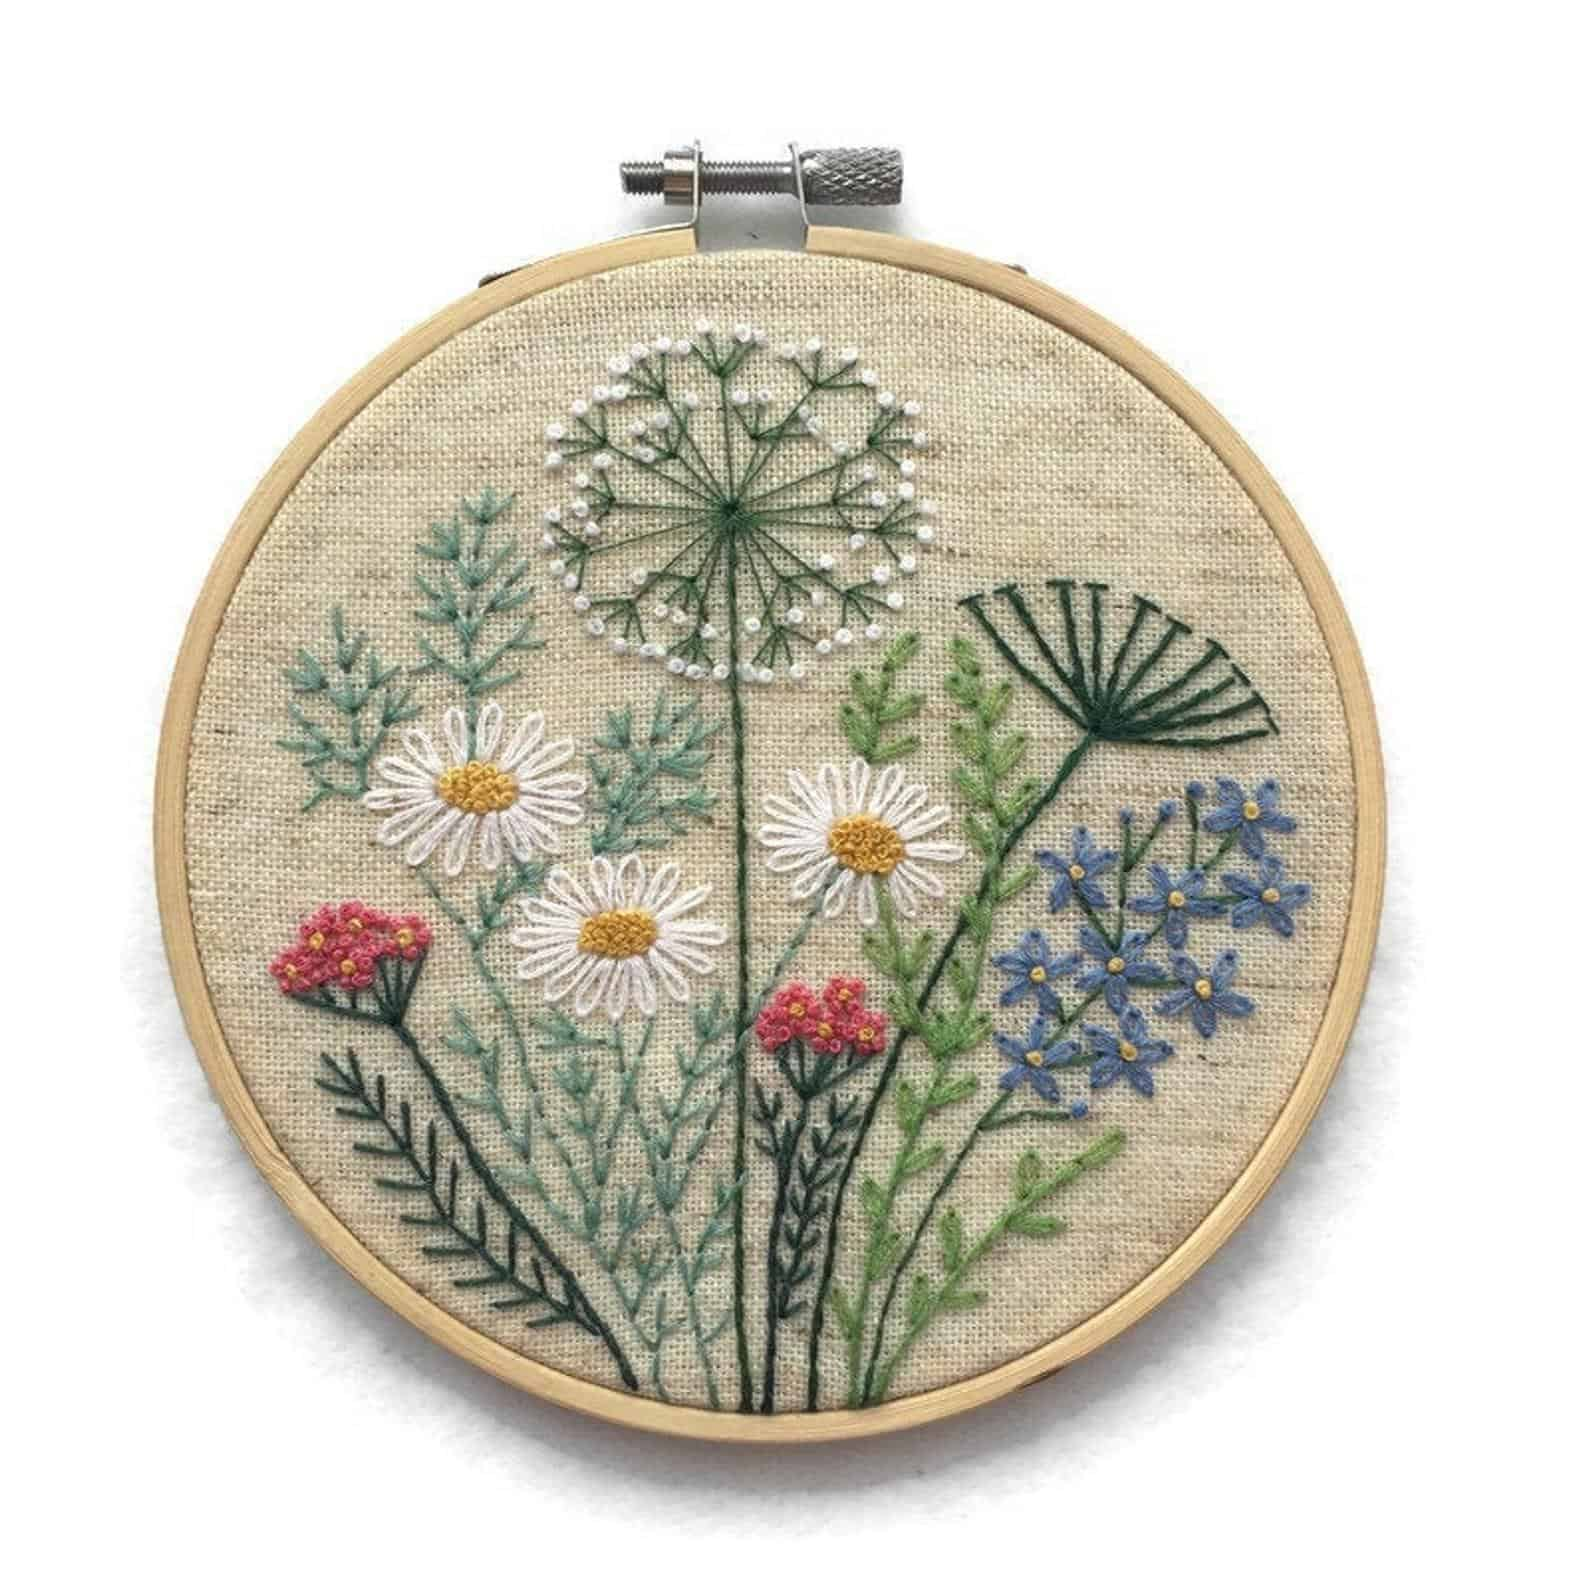 Broderie créative de fleurs et d'herbes